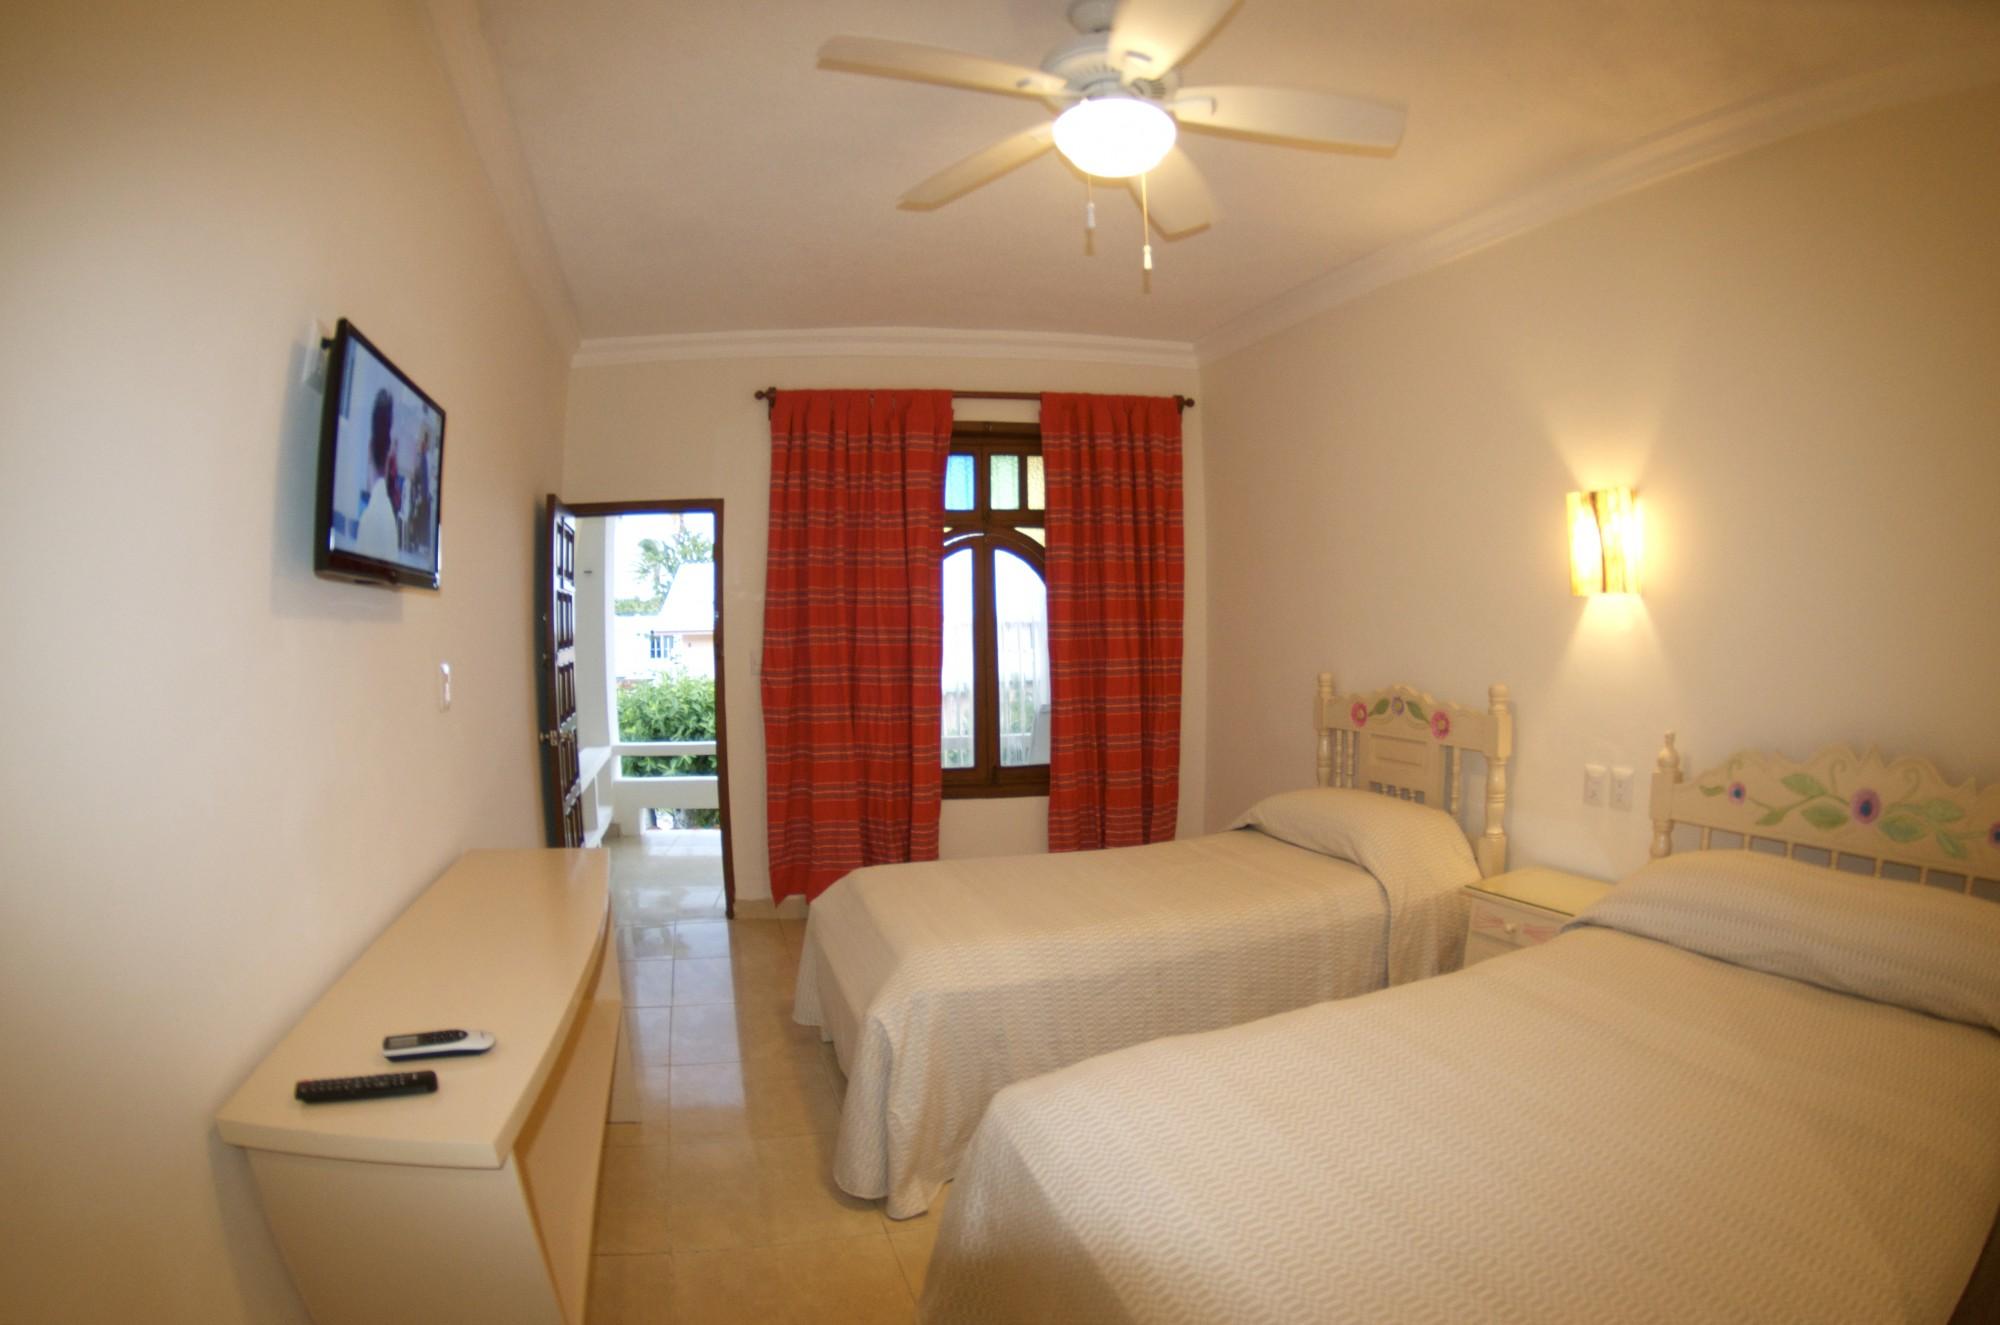 isla mujeres hotels, isla mujeres accommodation